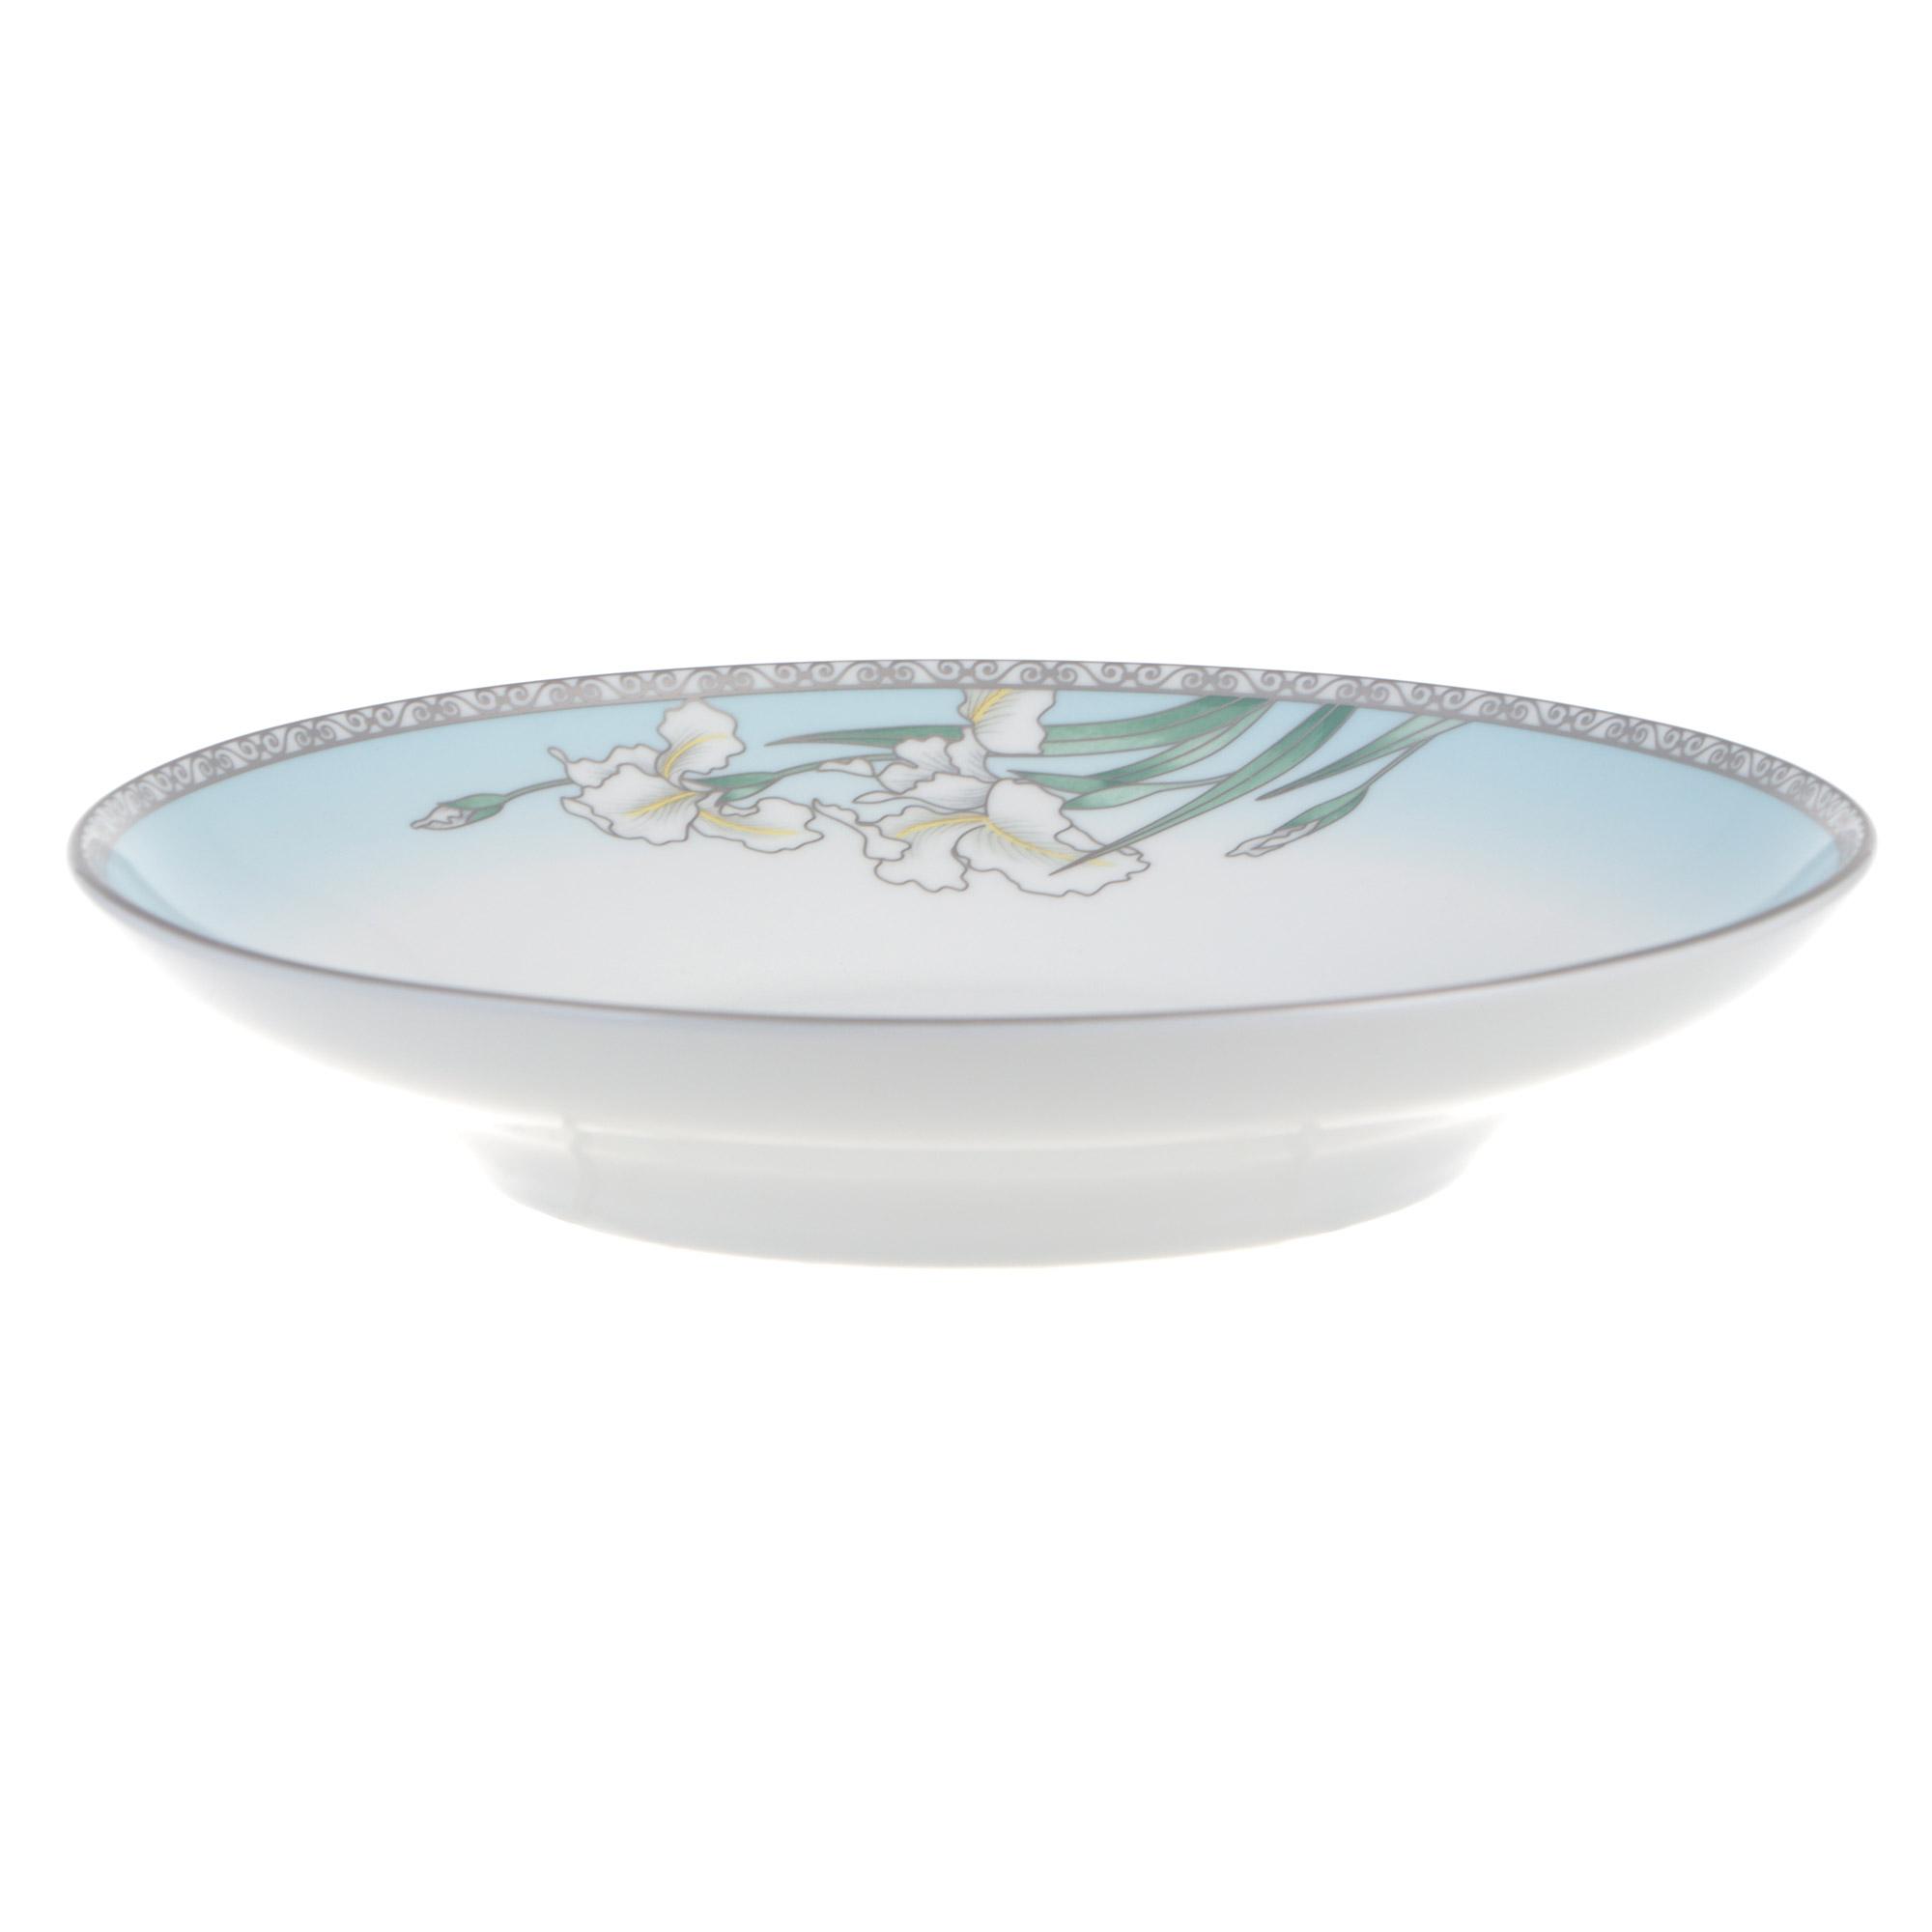 Фото - Набор суповых тарелок Hankook/Prouna Наос 23 см 6 шт набор суповых тарелок hankook prouna эпл би 23 см 6 шт